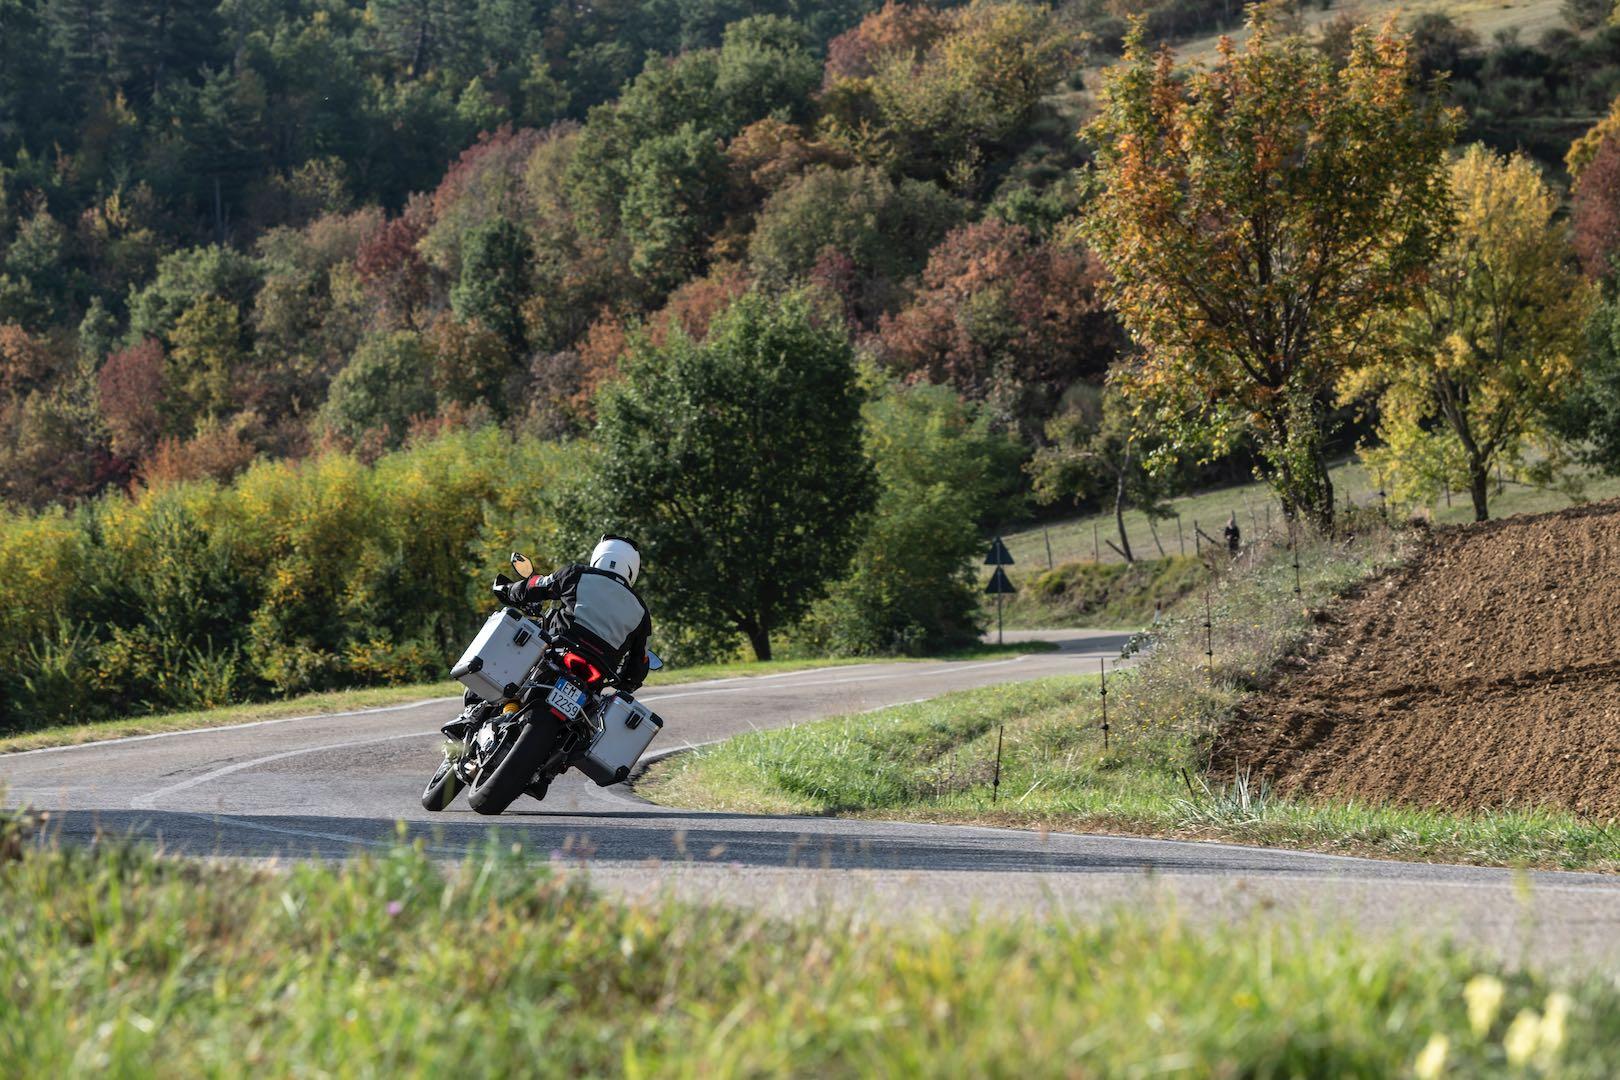 2019 Ducati Multistrada 1260 Enduro lean angle